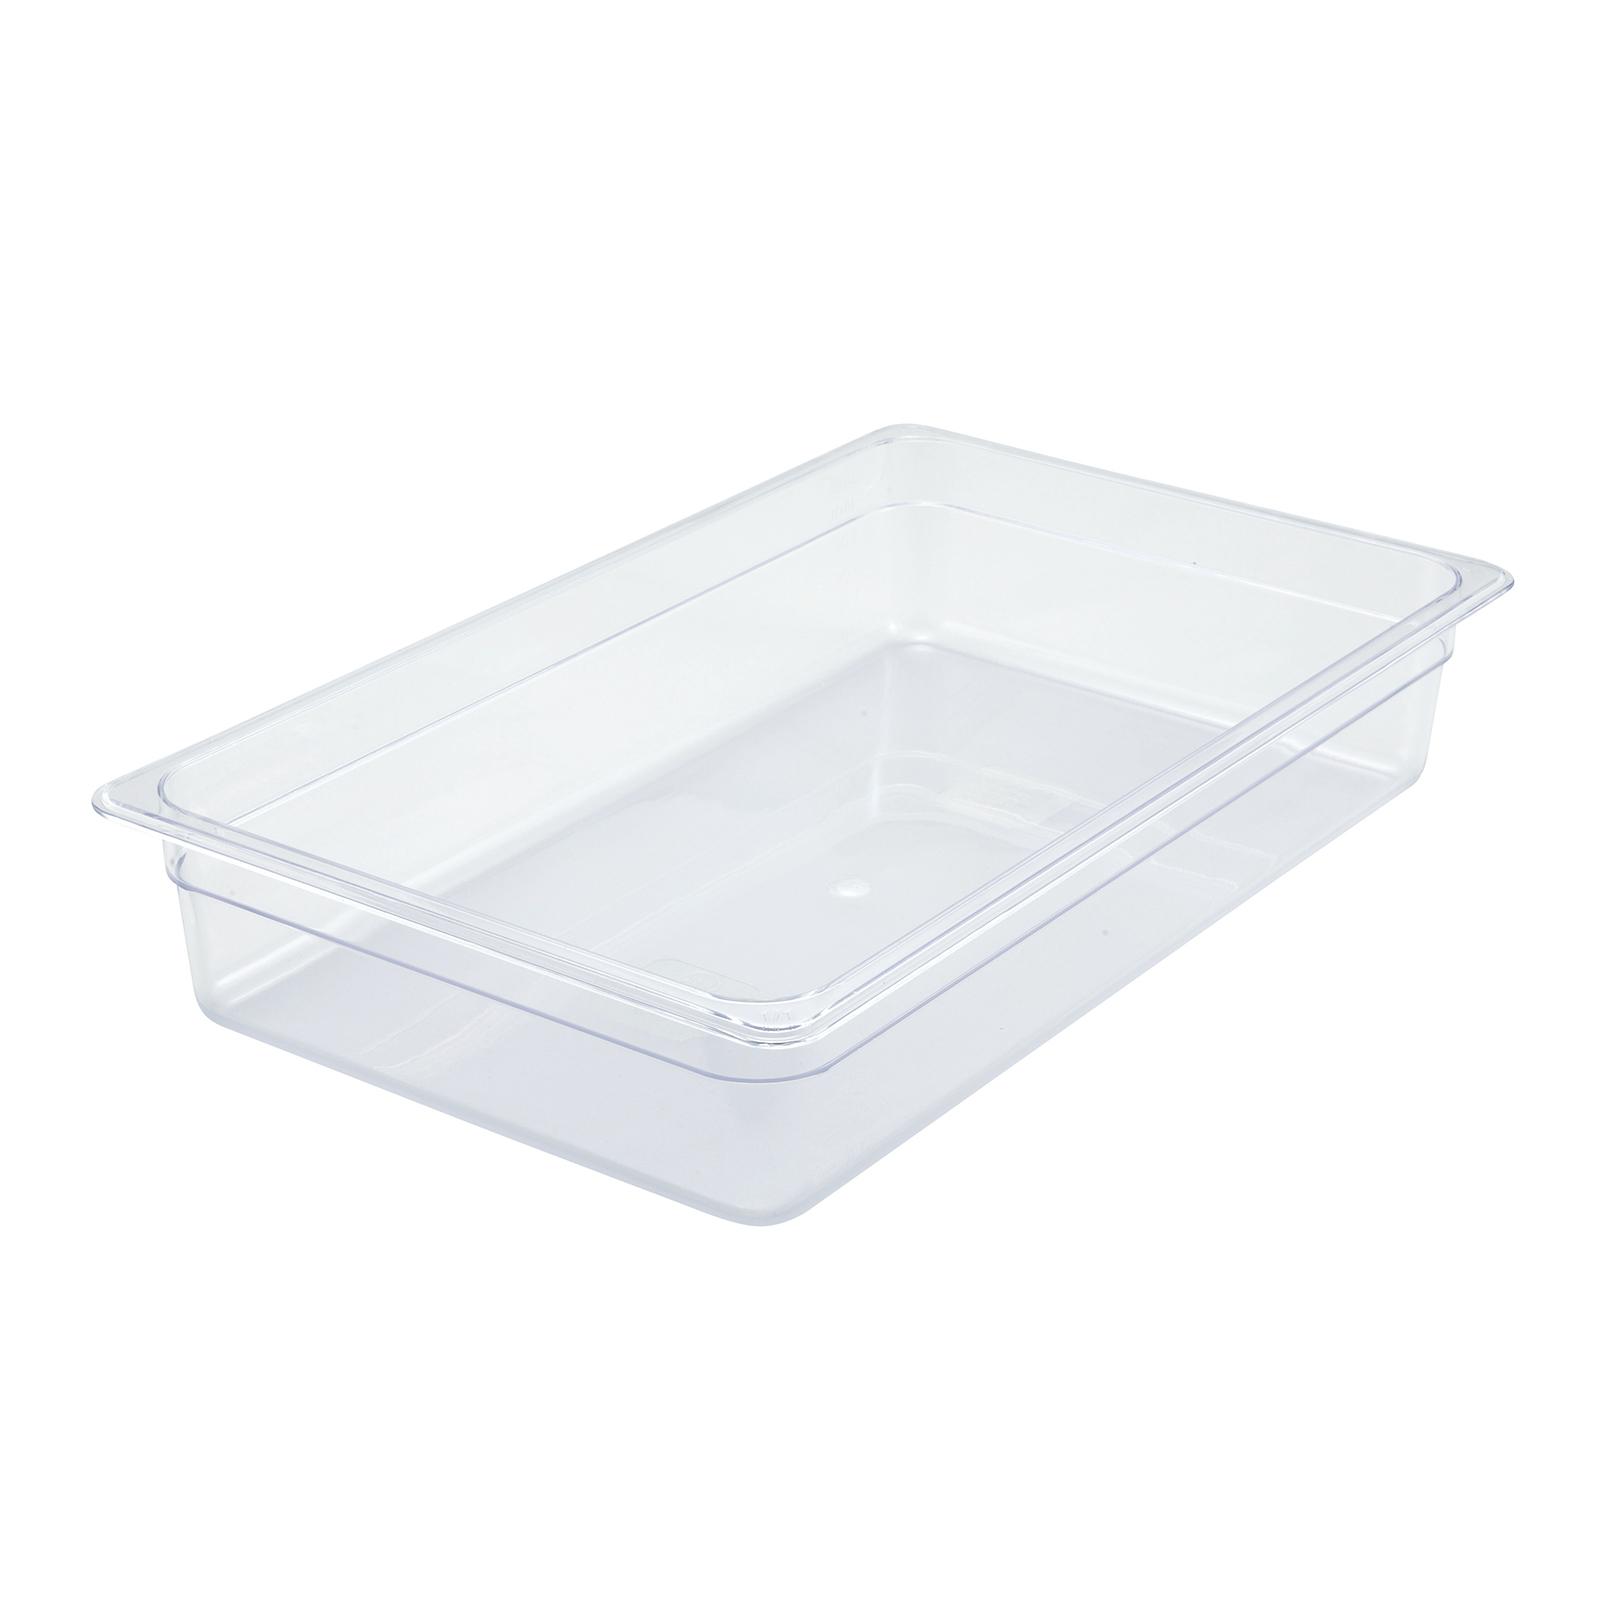 Winco SP7104 food pan, plastic